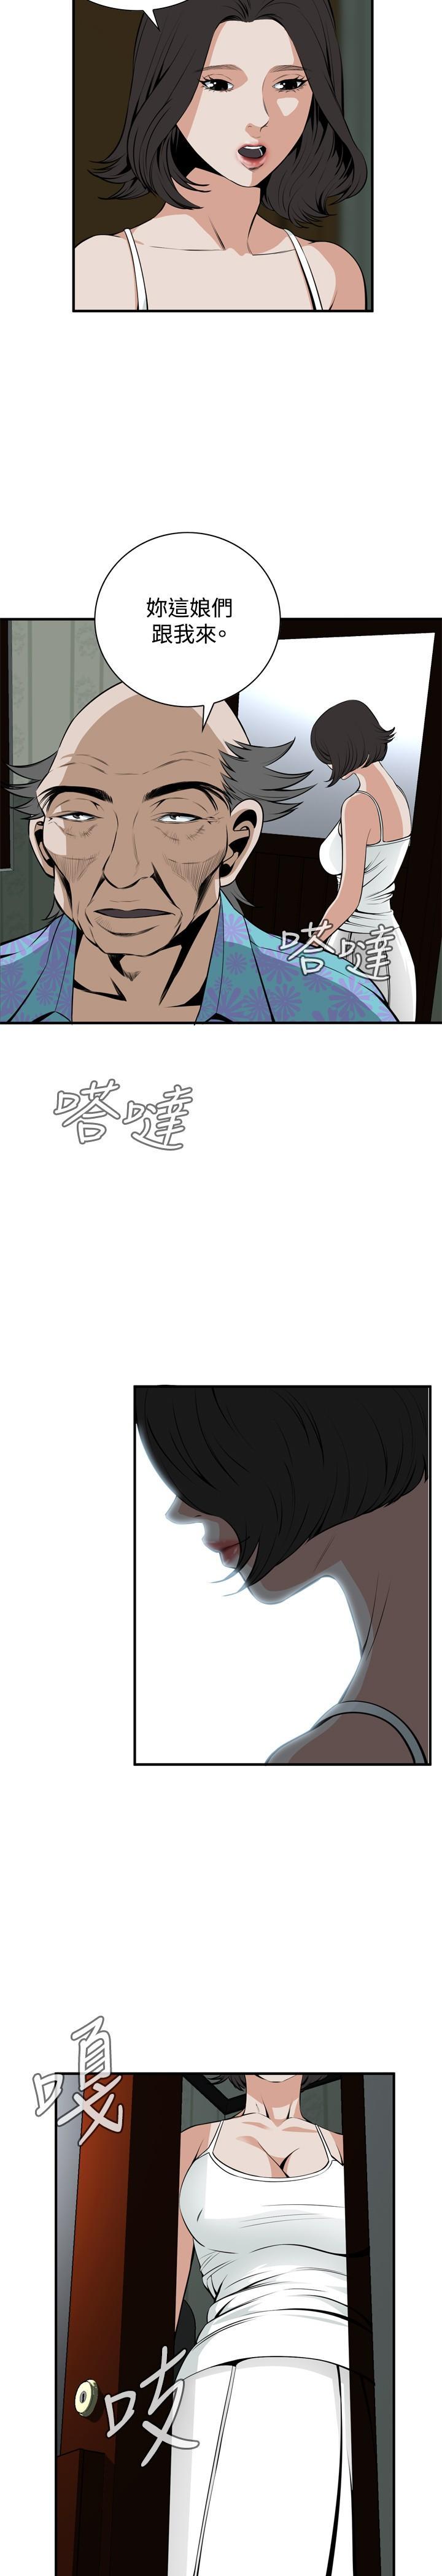 Take a Peek 偷窥 Ch.39~60 [Chinese]中文 114